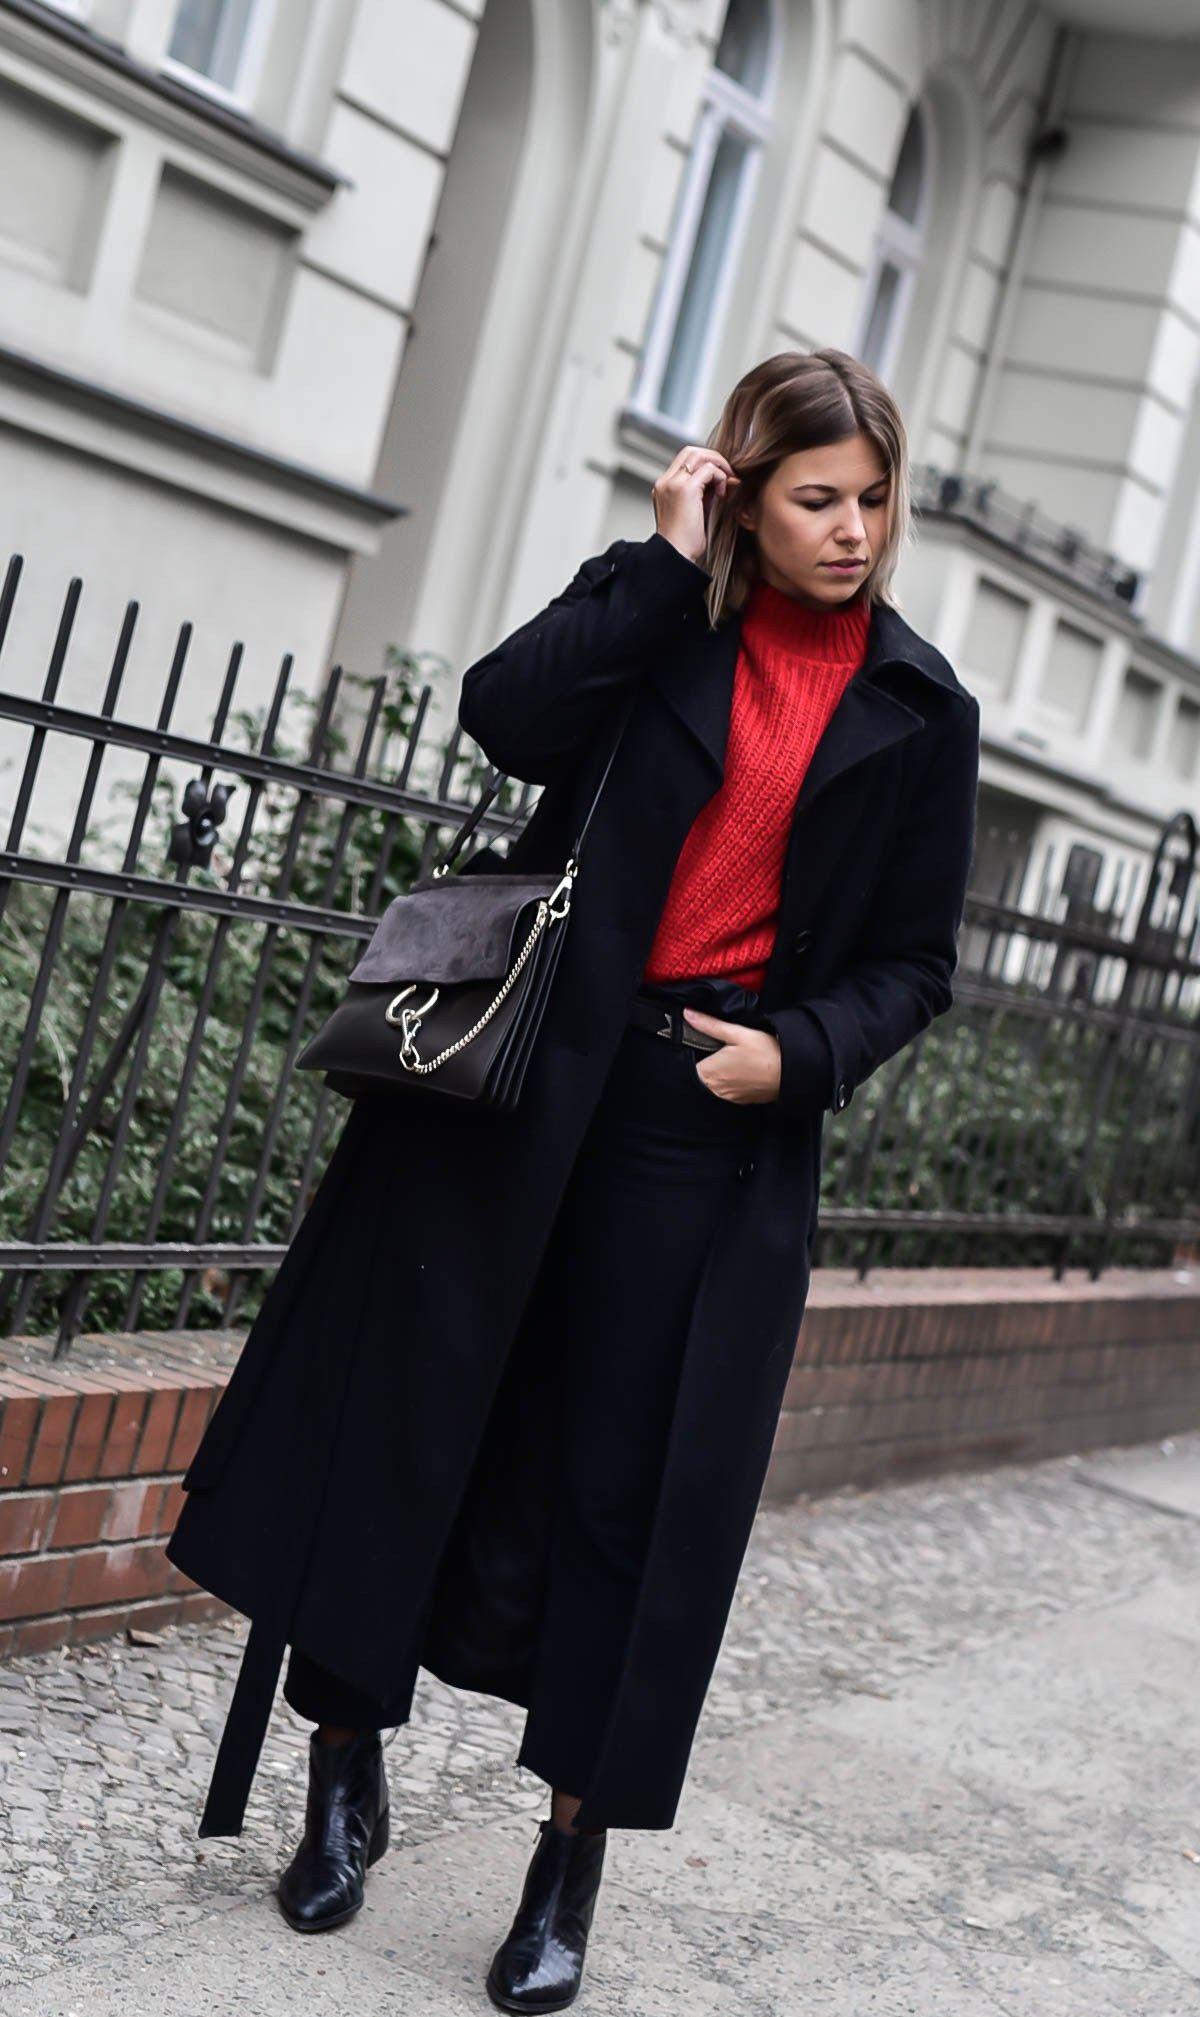 ärmel Modeblog strick pullover ballon fashionzauber outfit H2WIDE9Y